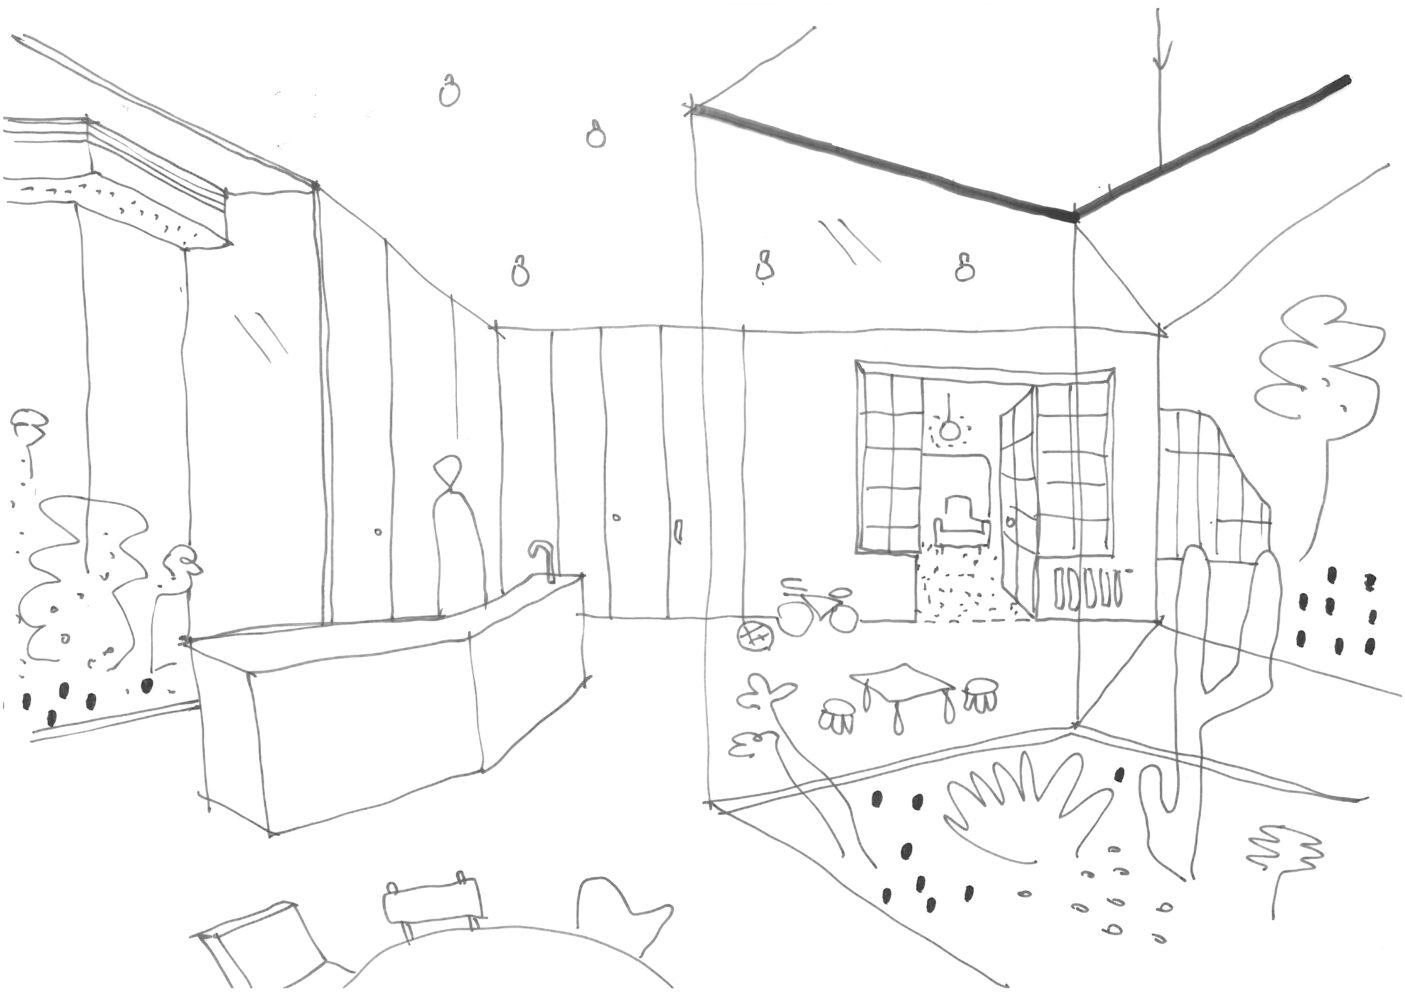 schets-tom1-scaled.jpg